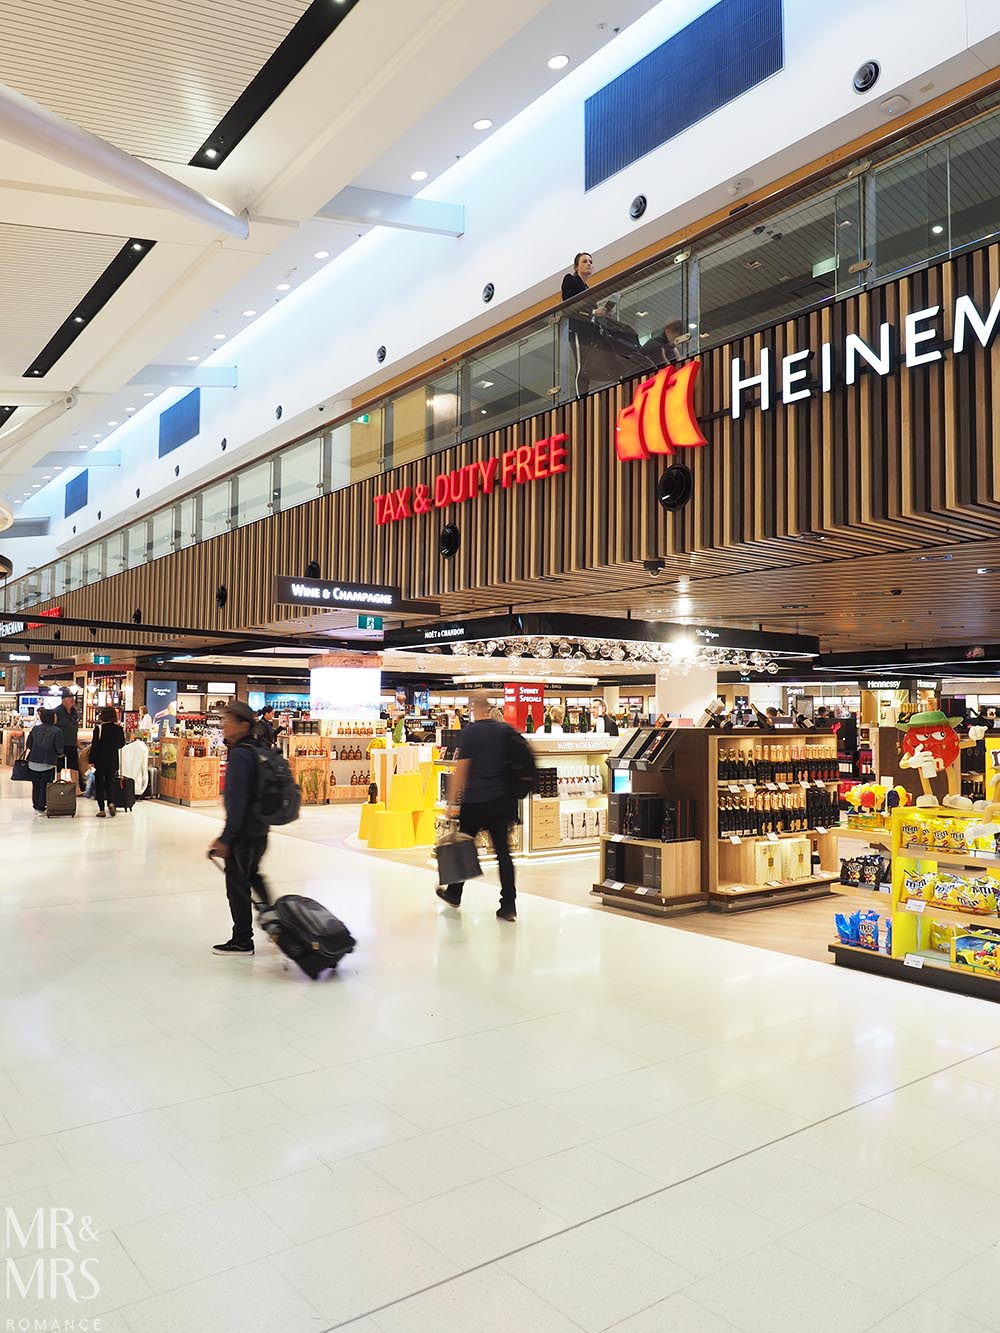 Sydney Airport guide - #wortharrivingearlyfor - MMR